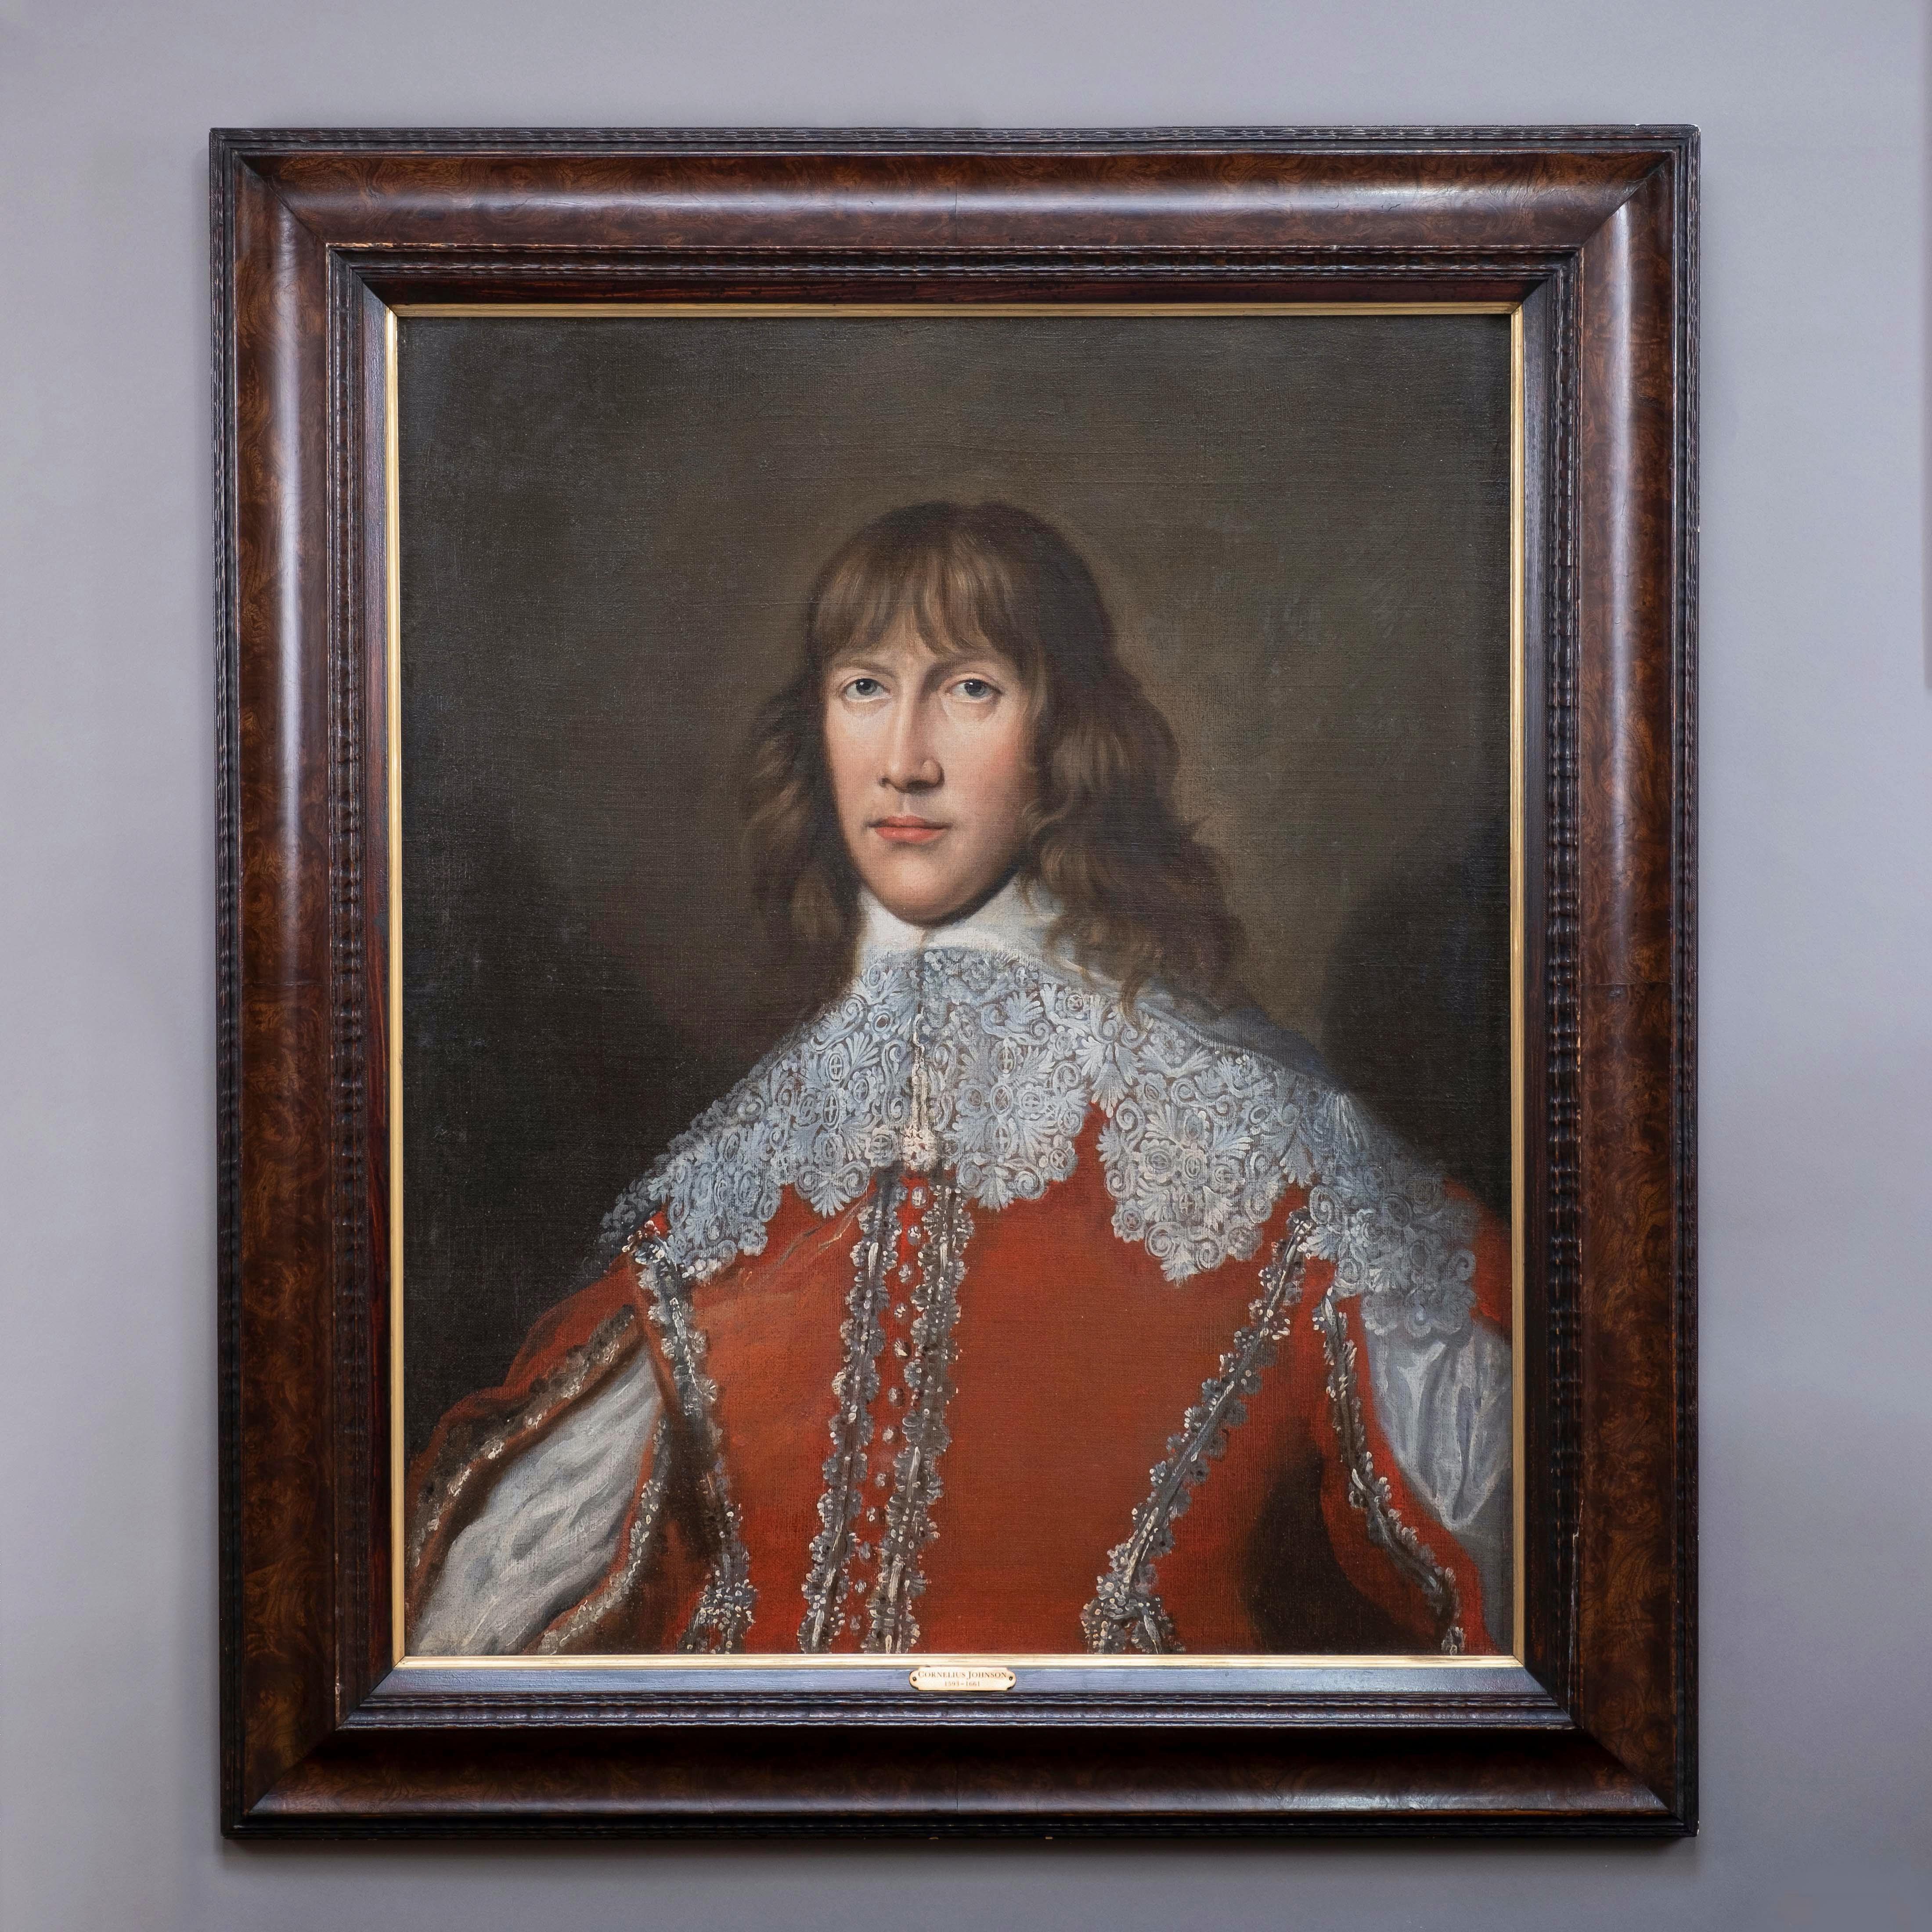 Attributed to Cornelius de Neve, Portrait of John, Lord Belasyse